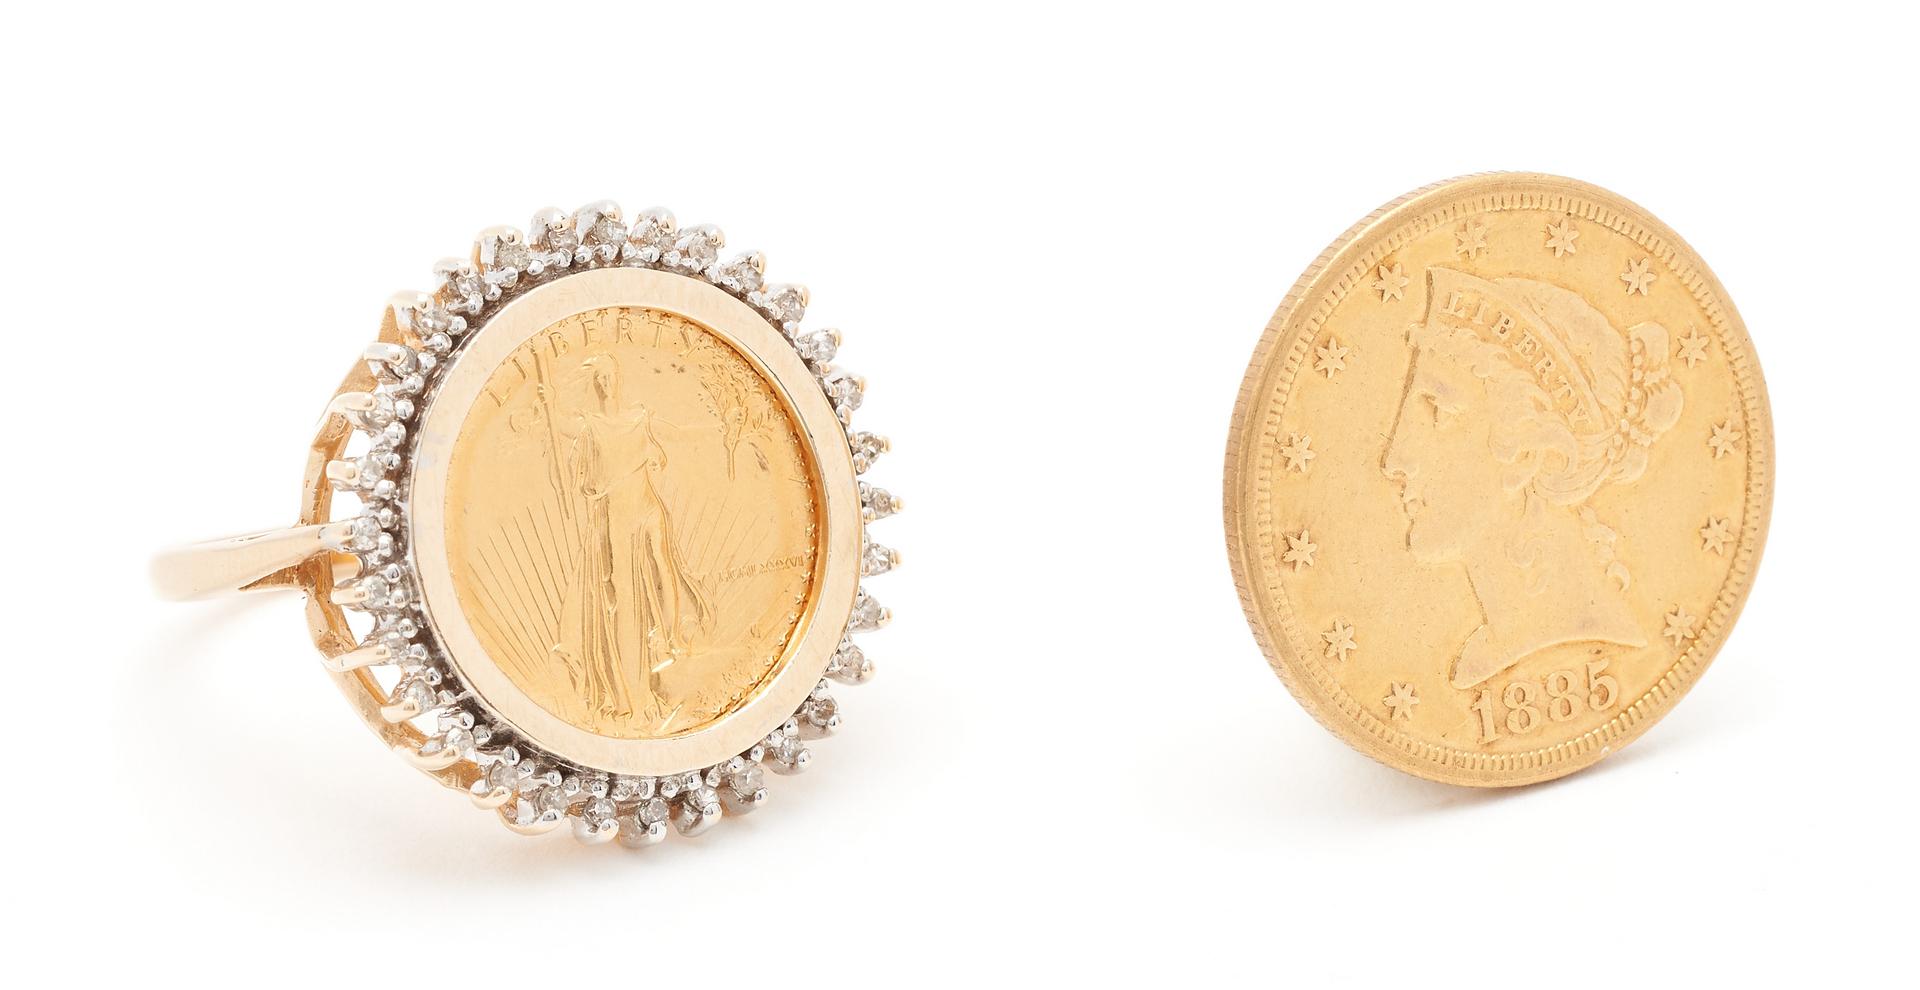 Lot 835: 2 $5 US Mint Gold Coins, incl. 1885 Liberty Head, 1986 American Eagle